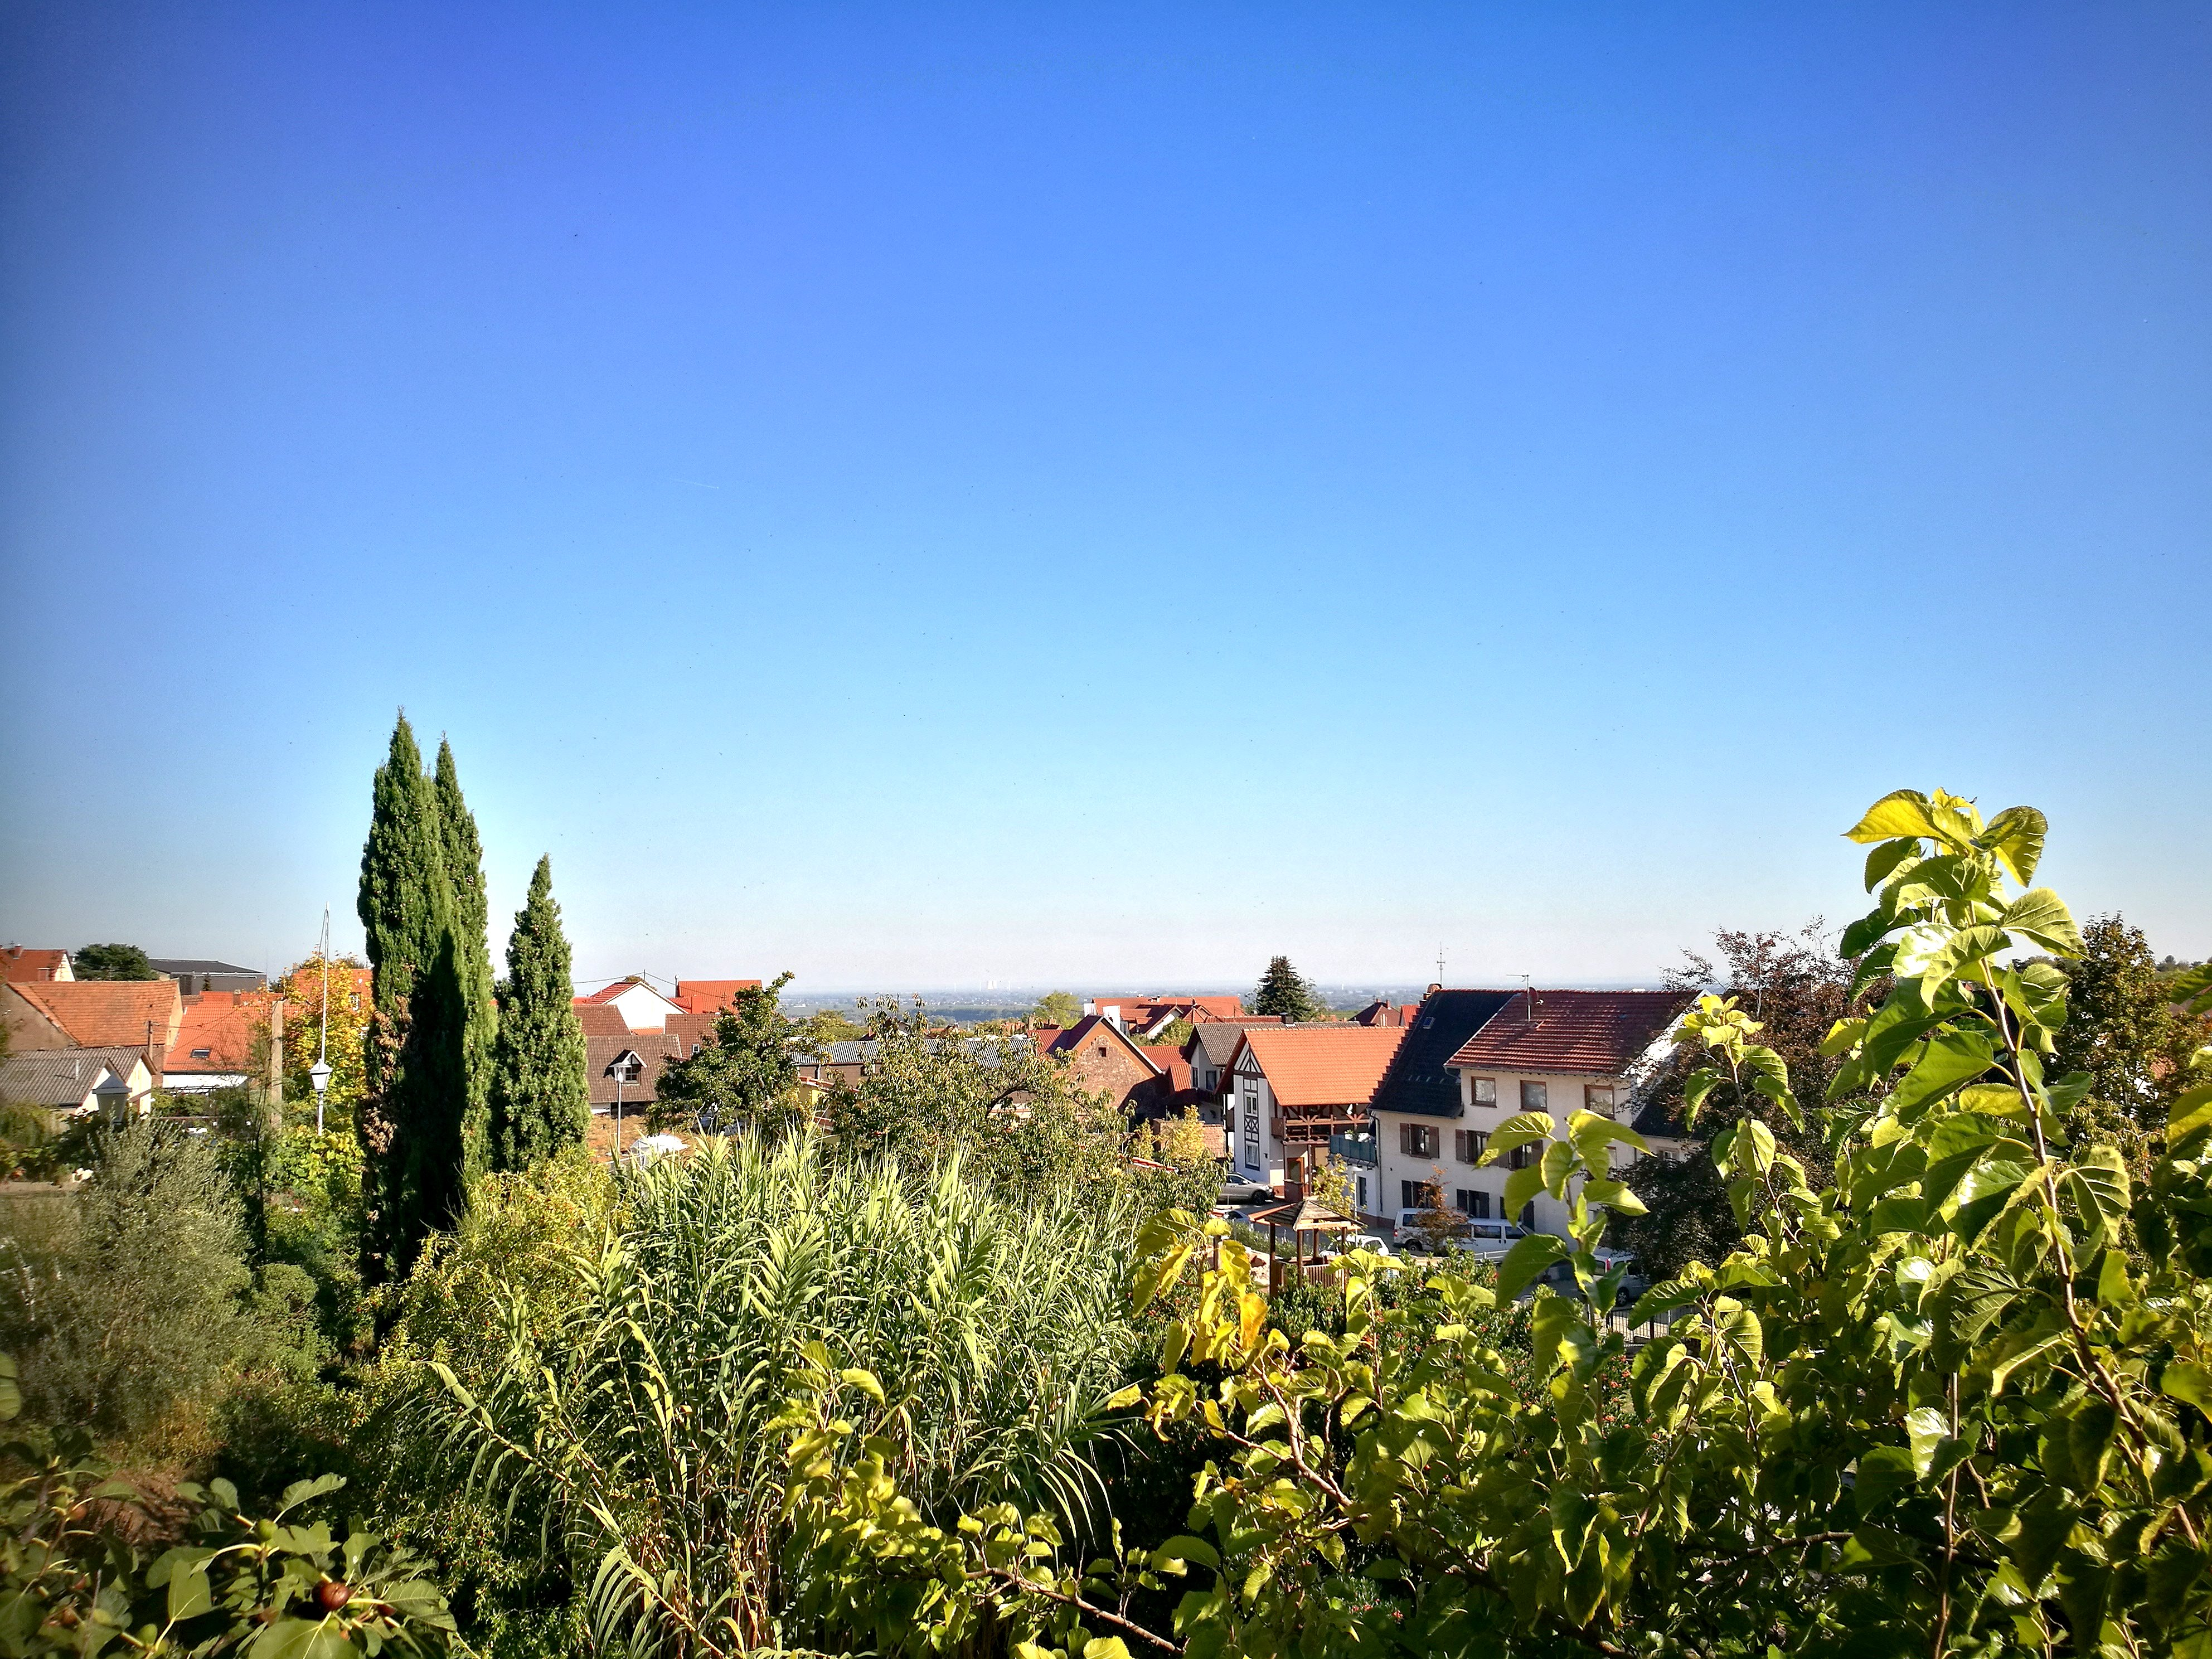 Pfalz 2018 (Teil 1)